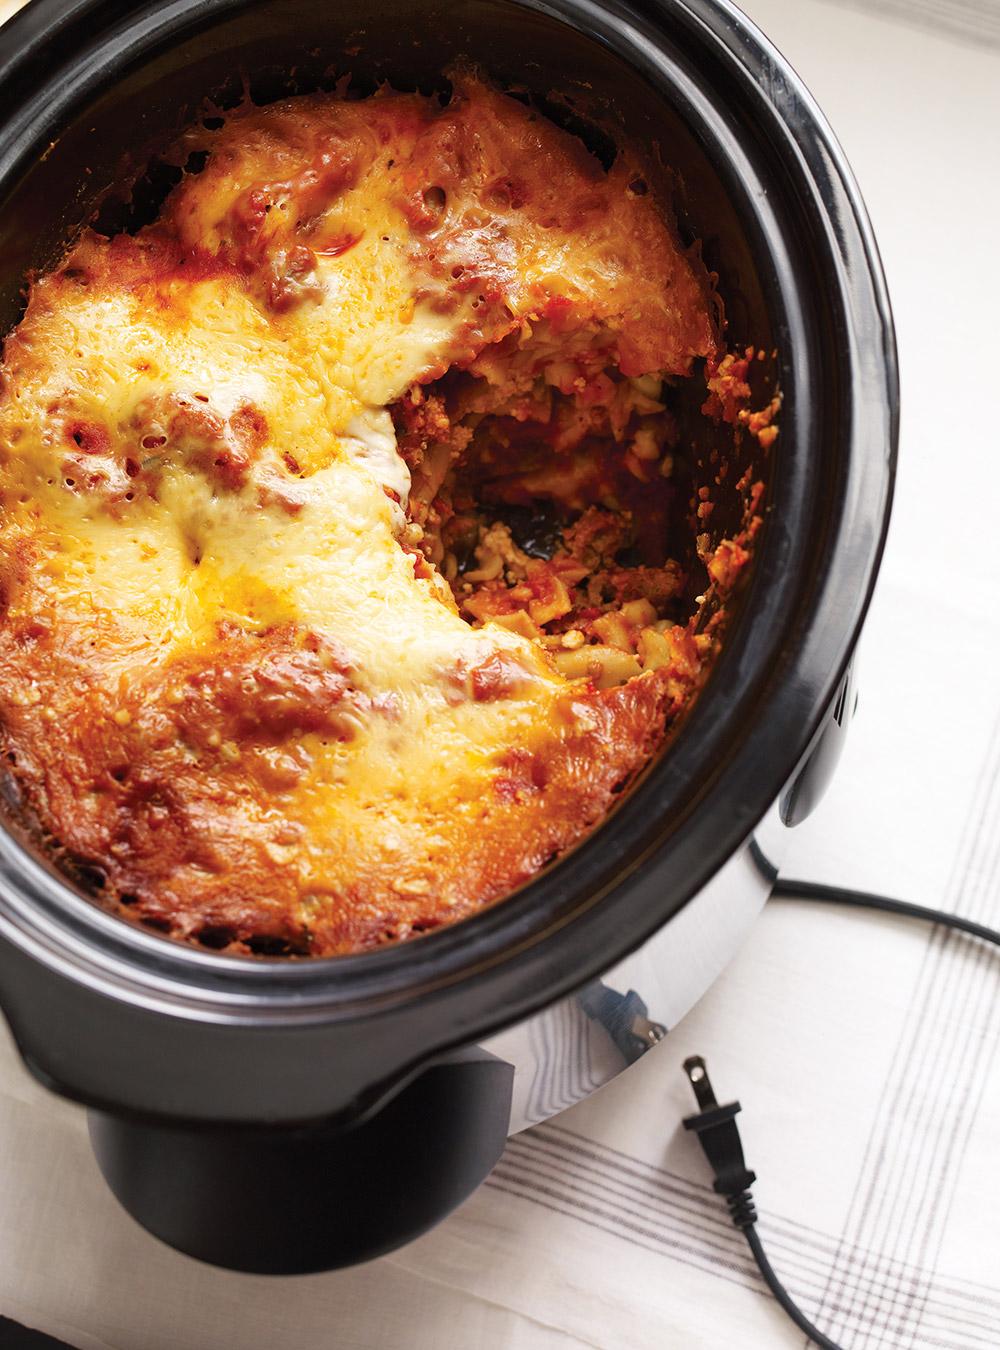 Lasagne la mijoteuse ricardo for Article de cuisine ricardo